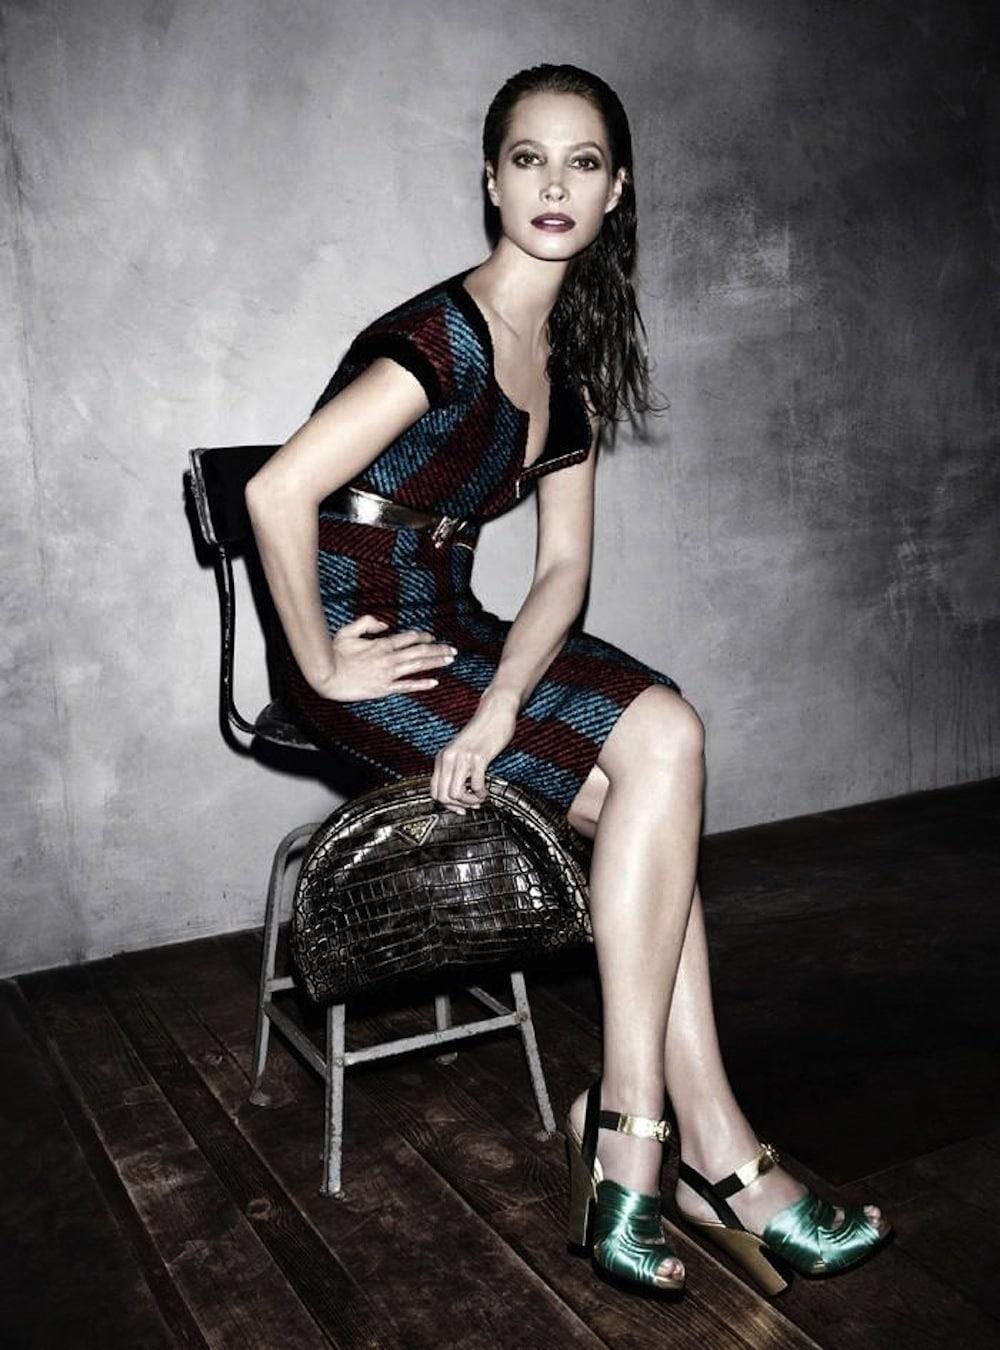 Prada Fall/Winter 2013 Ad Campaign | Spotted Fashion